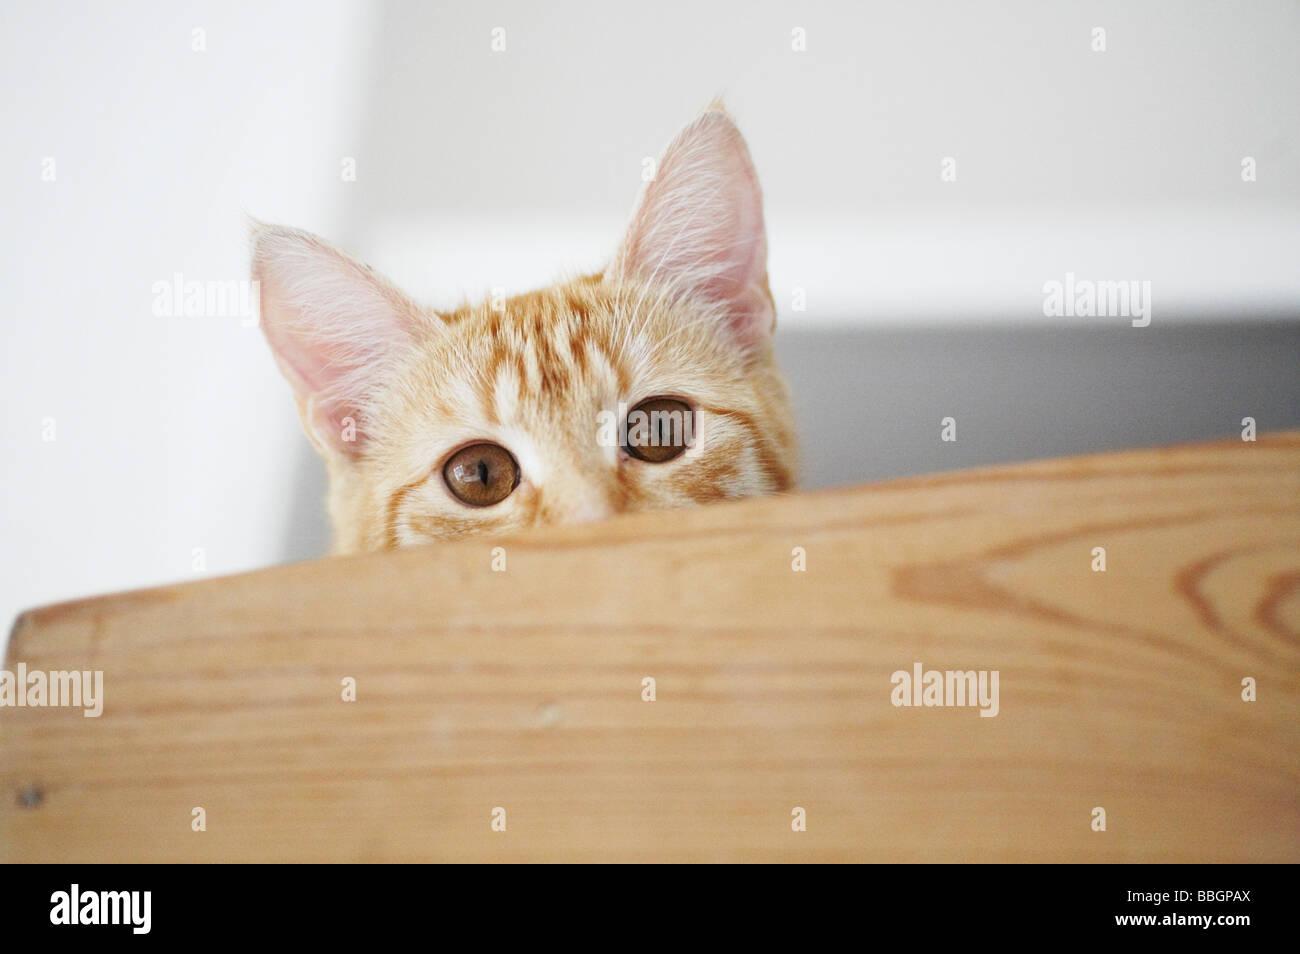 Impertinente naughty cat kitten ocultar jugando al escondite de jengibre atigrado pet Imagen De Stock